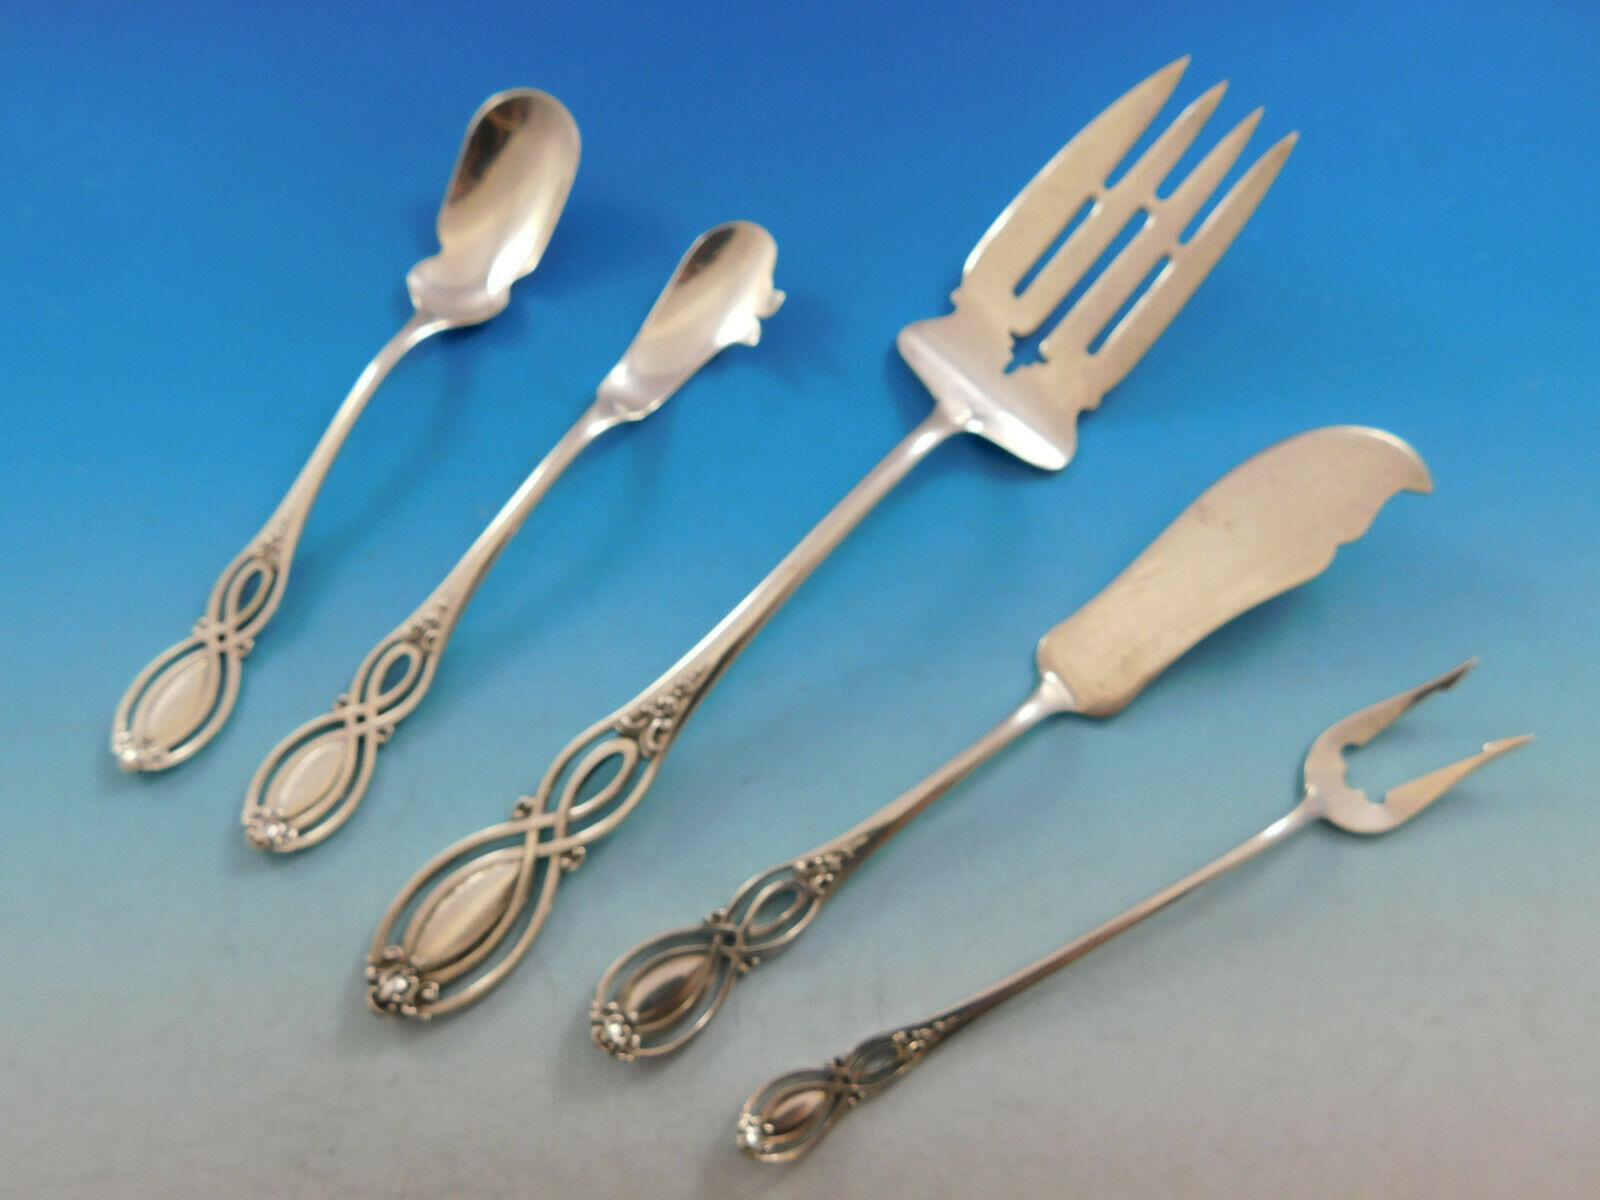 Alvin Majestic Salad Fork 4 Tine W// Bar Pierced Sterling Silver Flatware